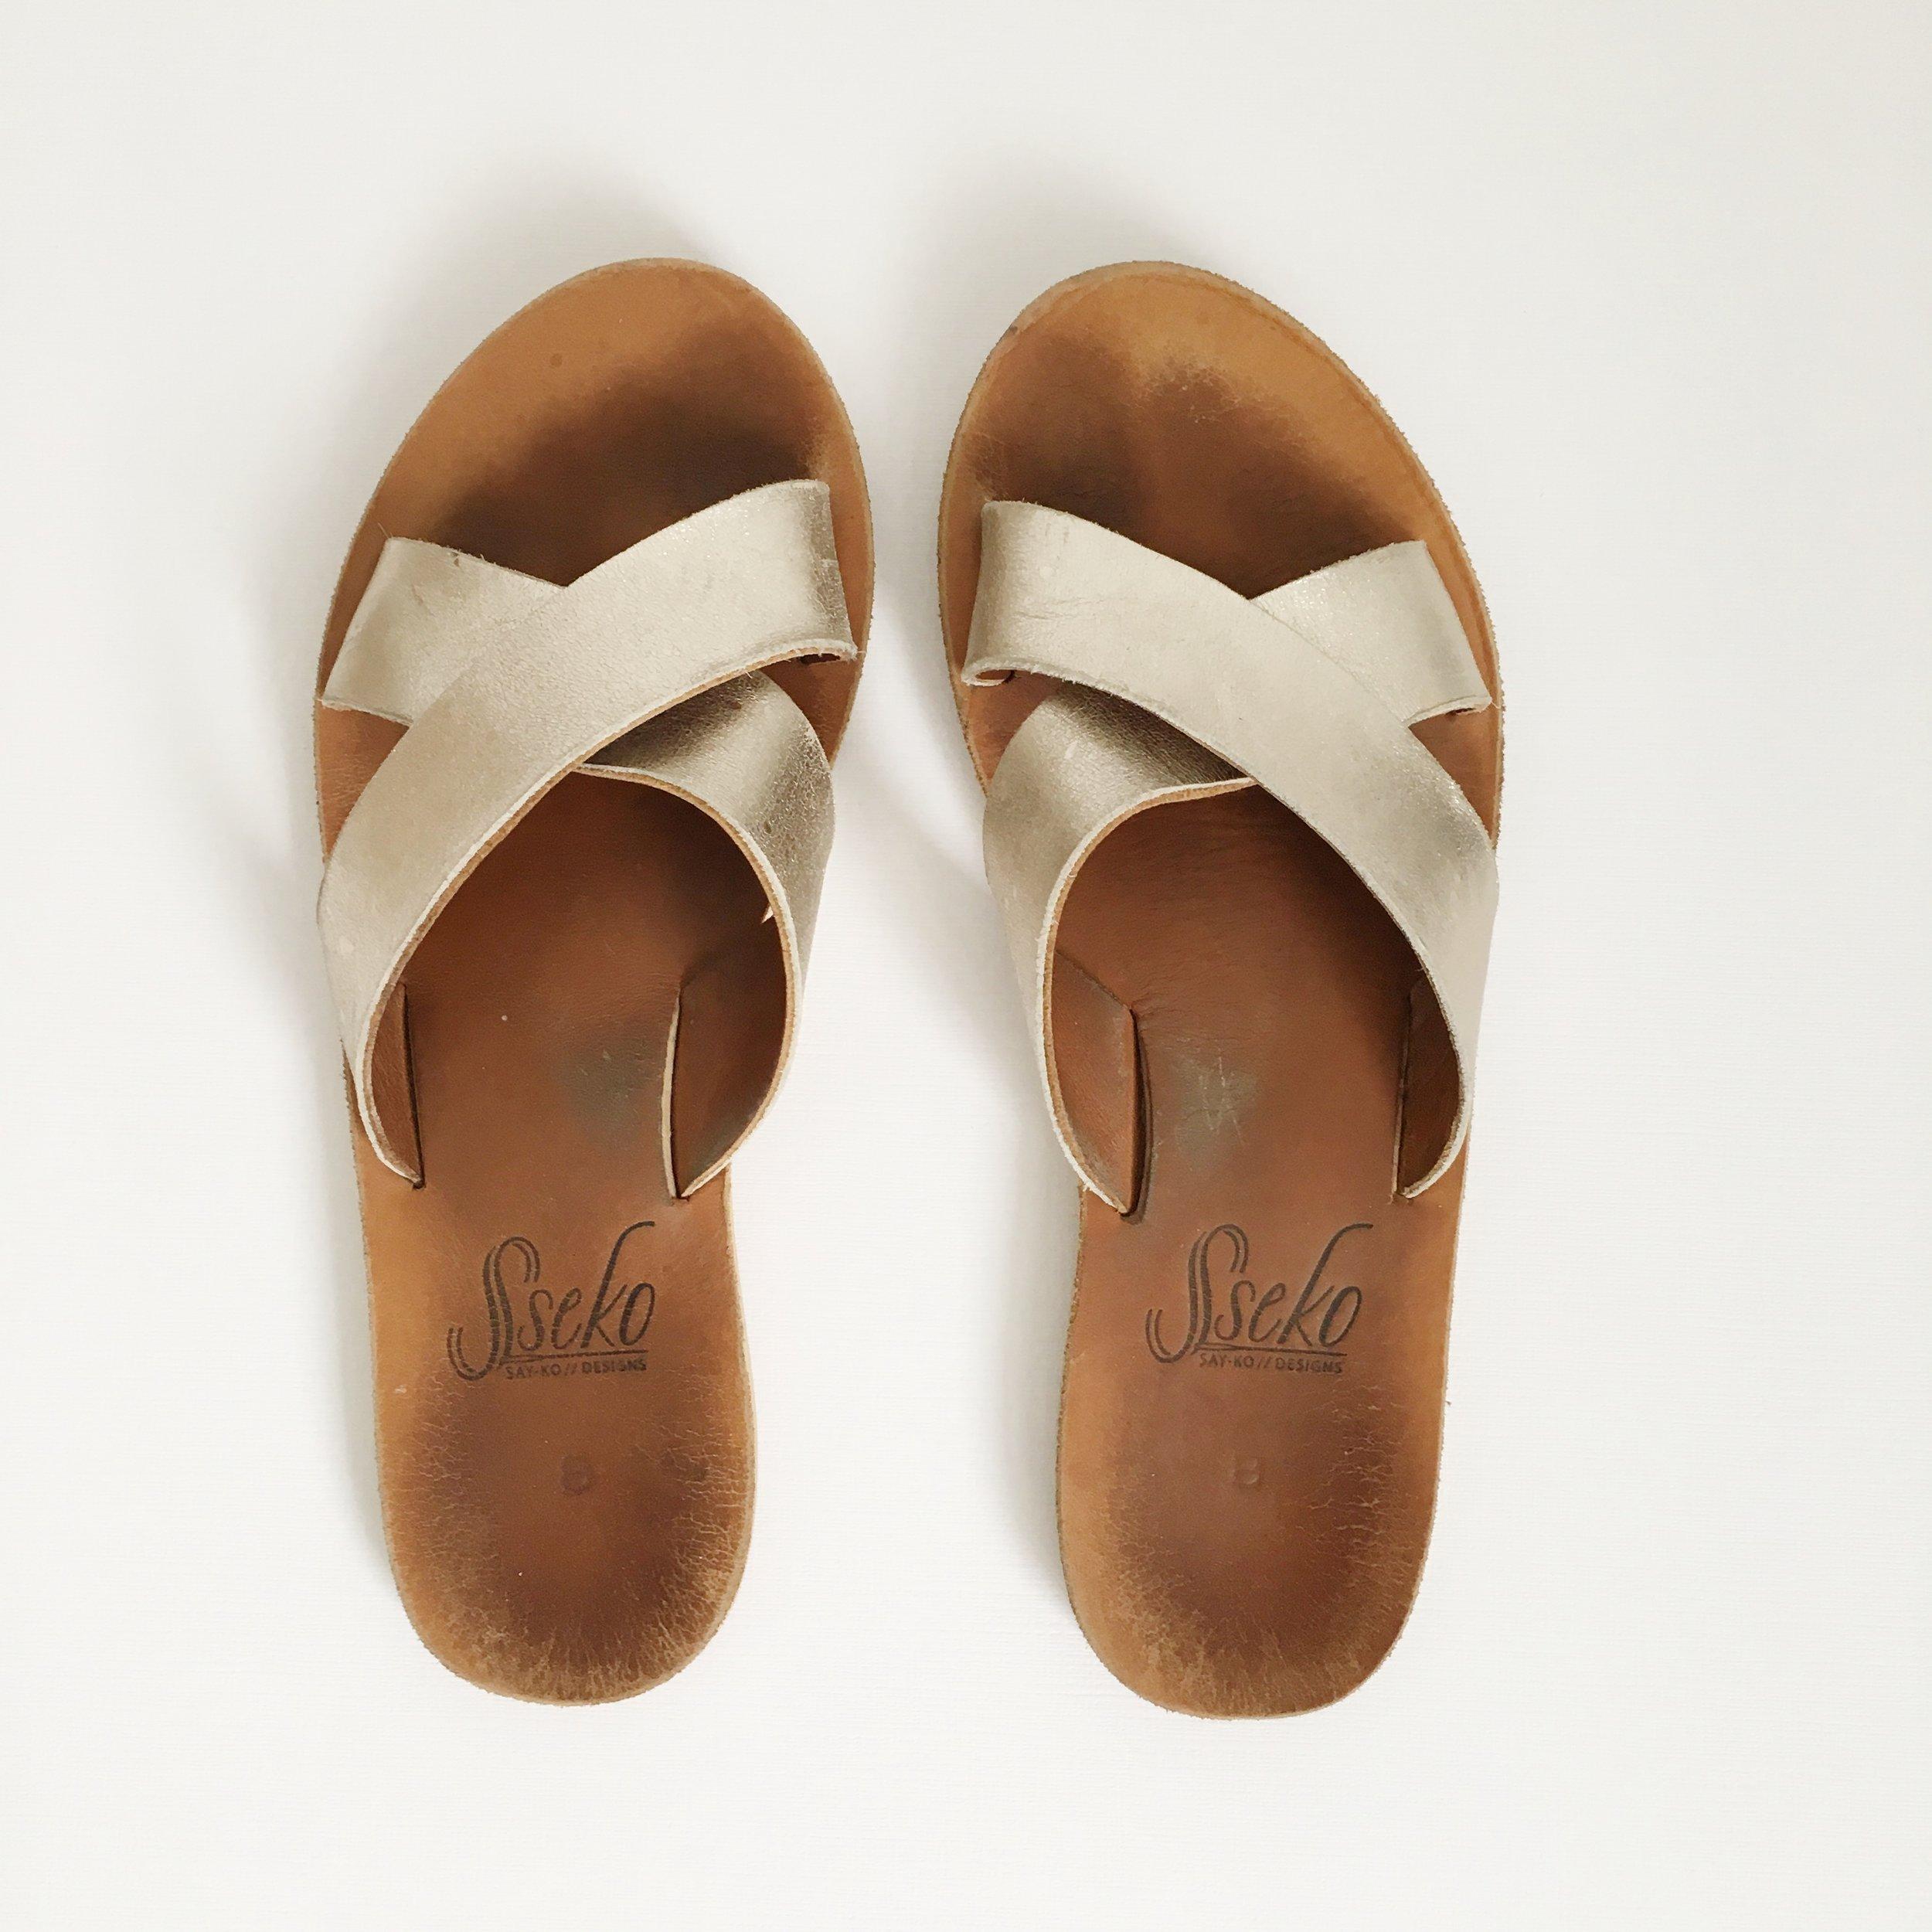 Sseko sandals; ethical brand, fair trade